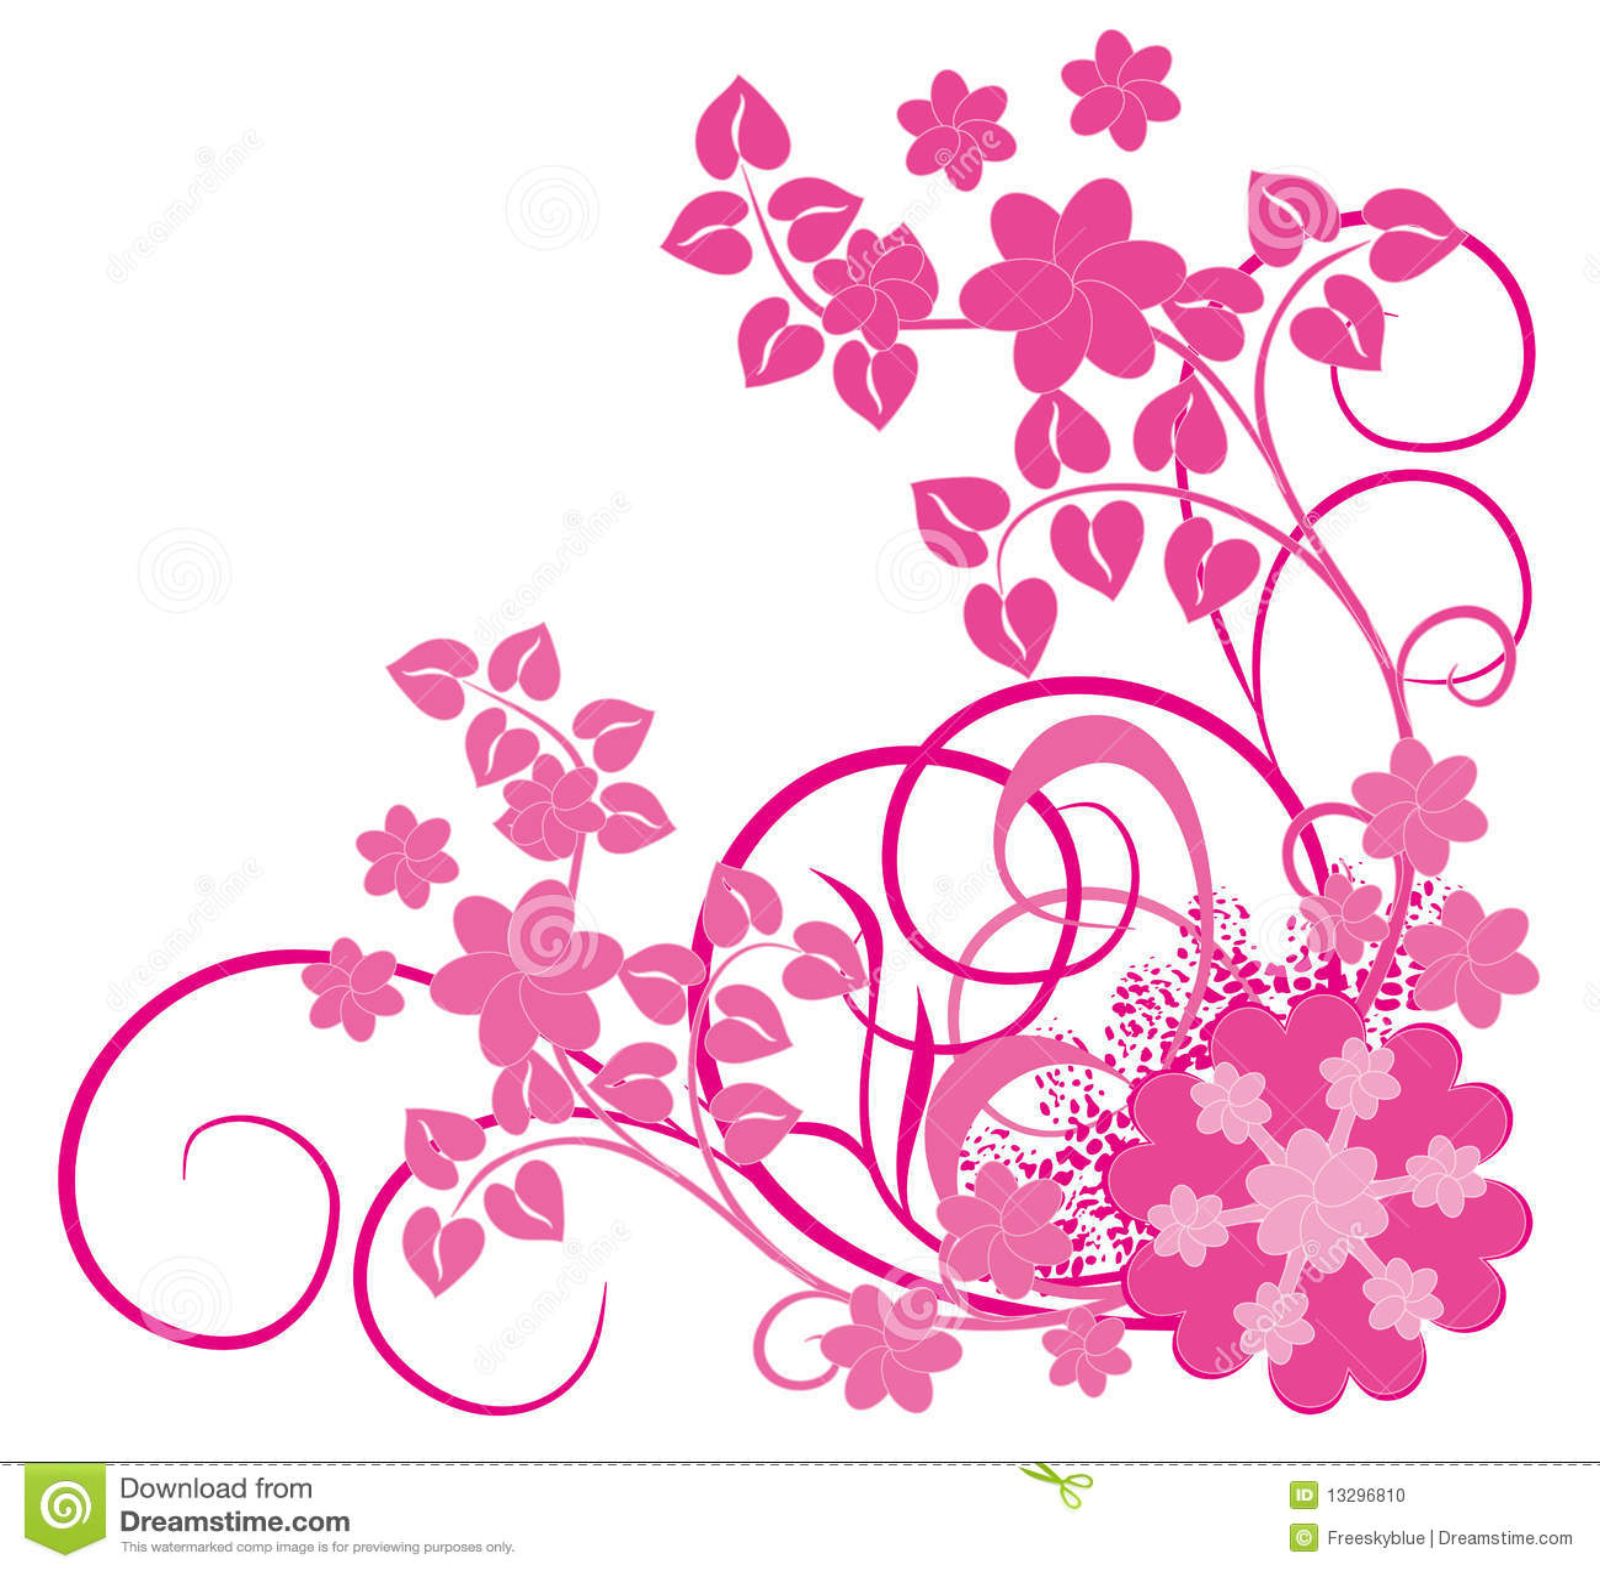 Pink Flower Vines Stock Illustrations 325 Pink Flower Vines Stock